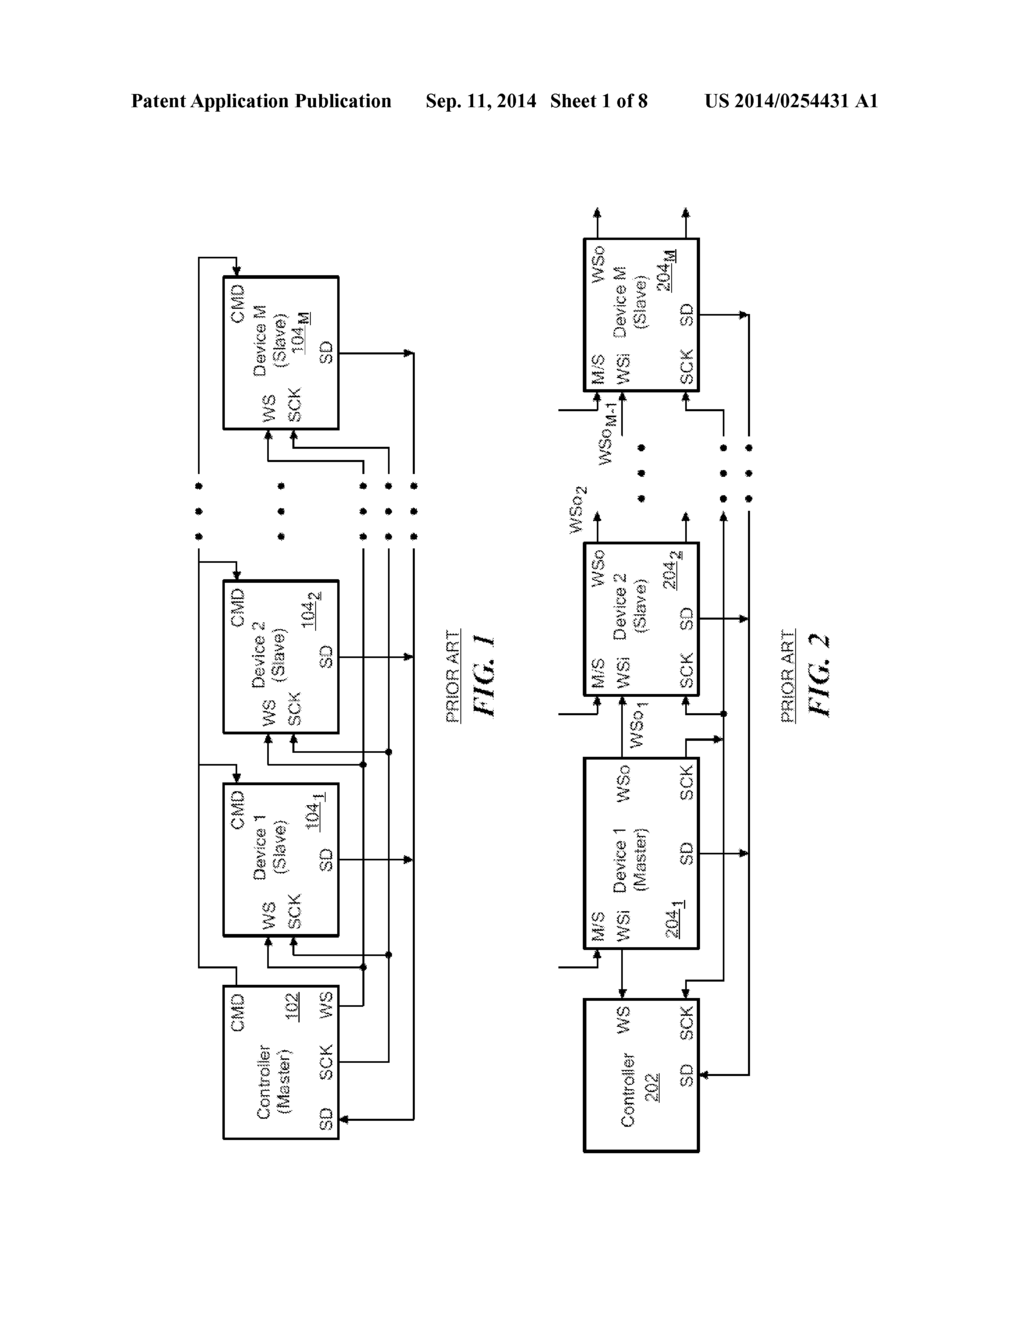 Claymore Mine Daisy Chain Wiring Diagram Schematic Diagrams For 1973 Volvo 1800 Es